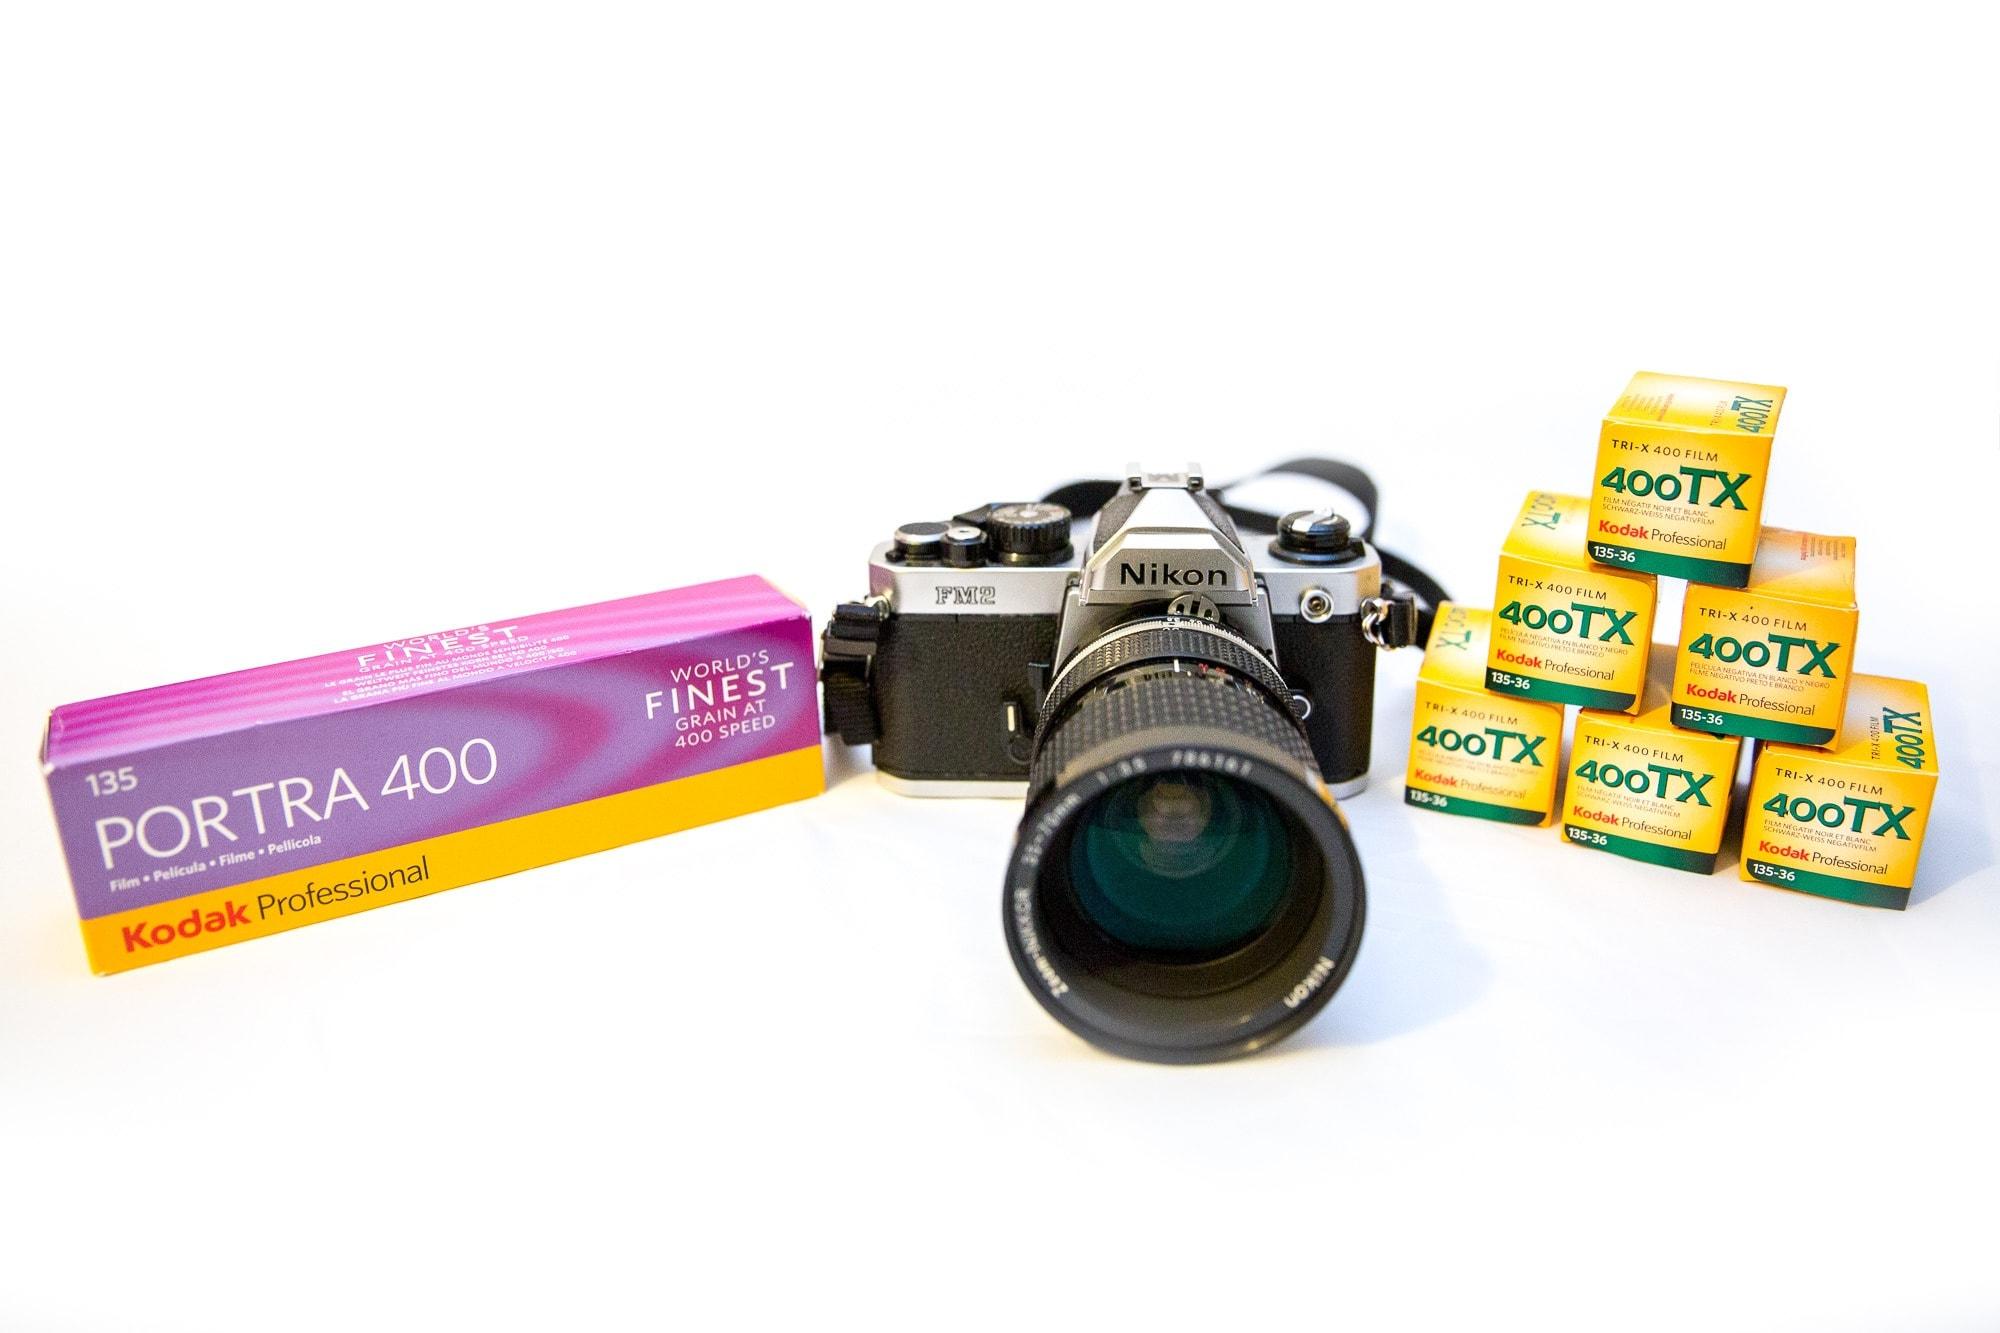 Nikon FM2 with Kodak Portra and Kodak Tri X